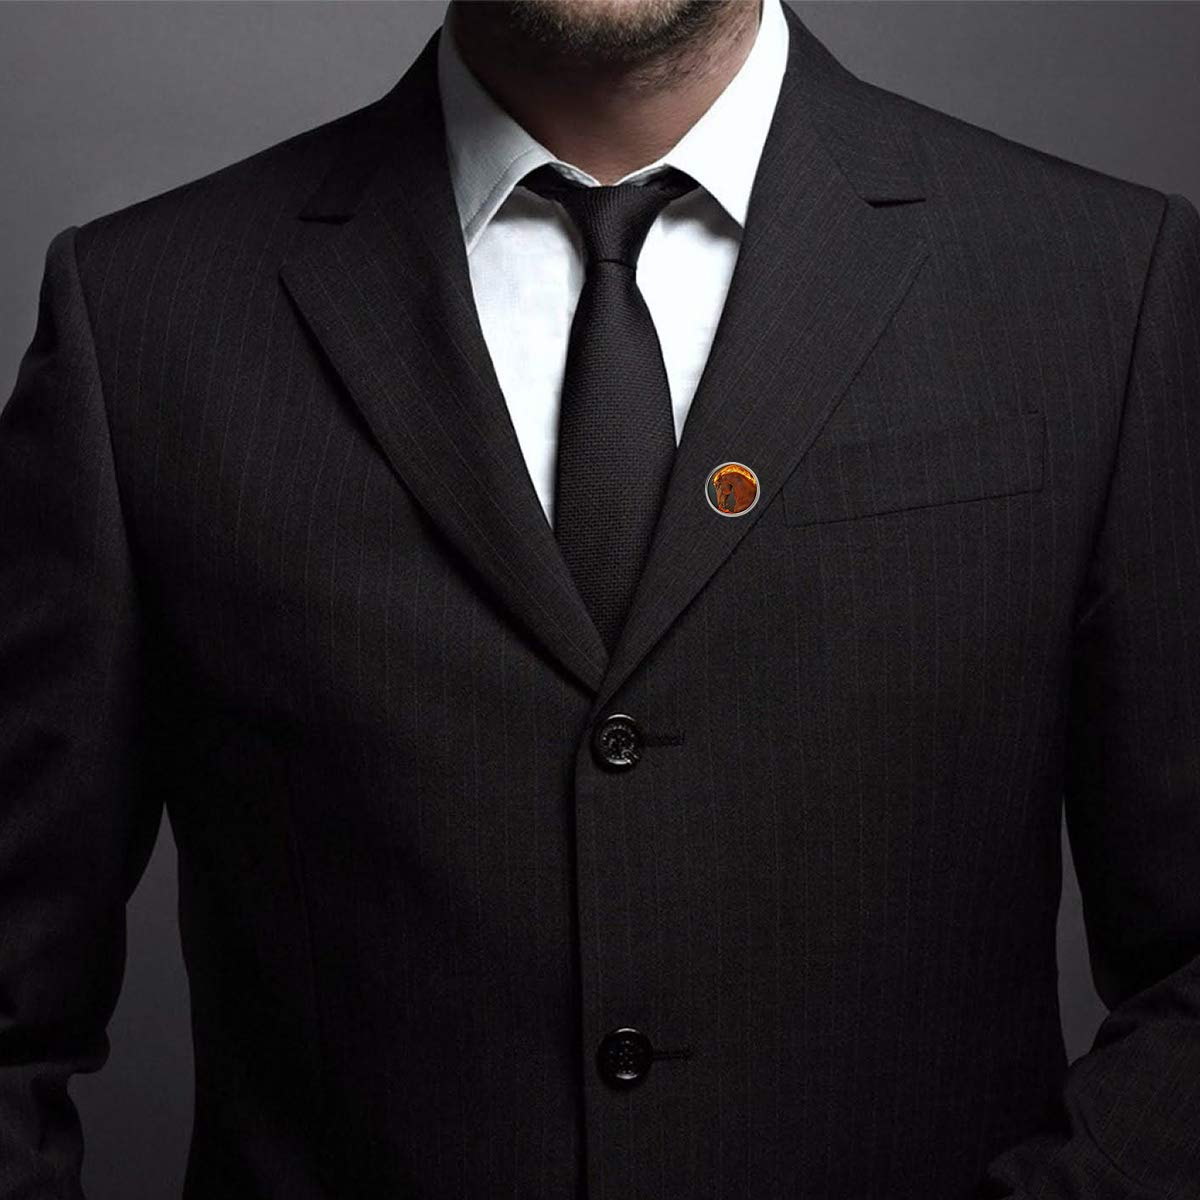 WAZZIT Round Metal Tie Tack Hat Lapel Pin Brooches Fire War Horse Banquet Badge Enamel Pins Trendy Accessory Jacket T-Shirt